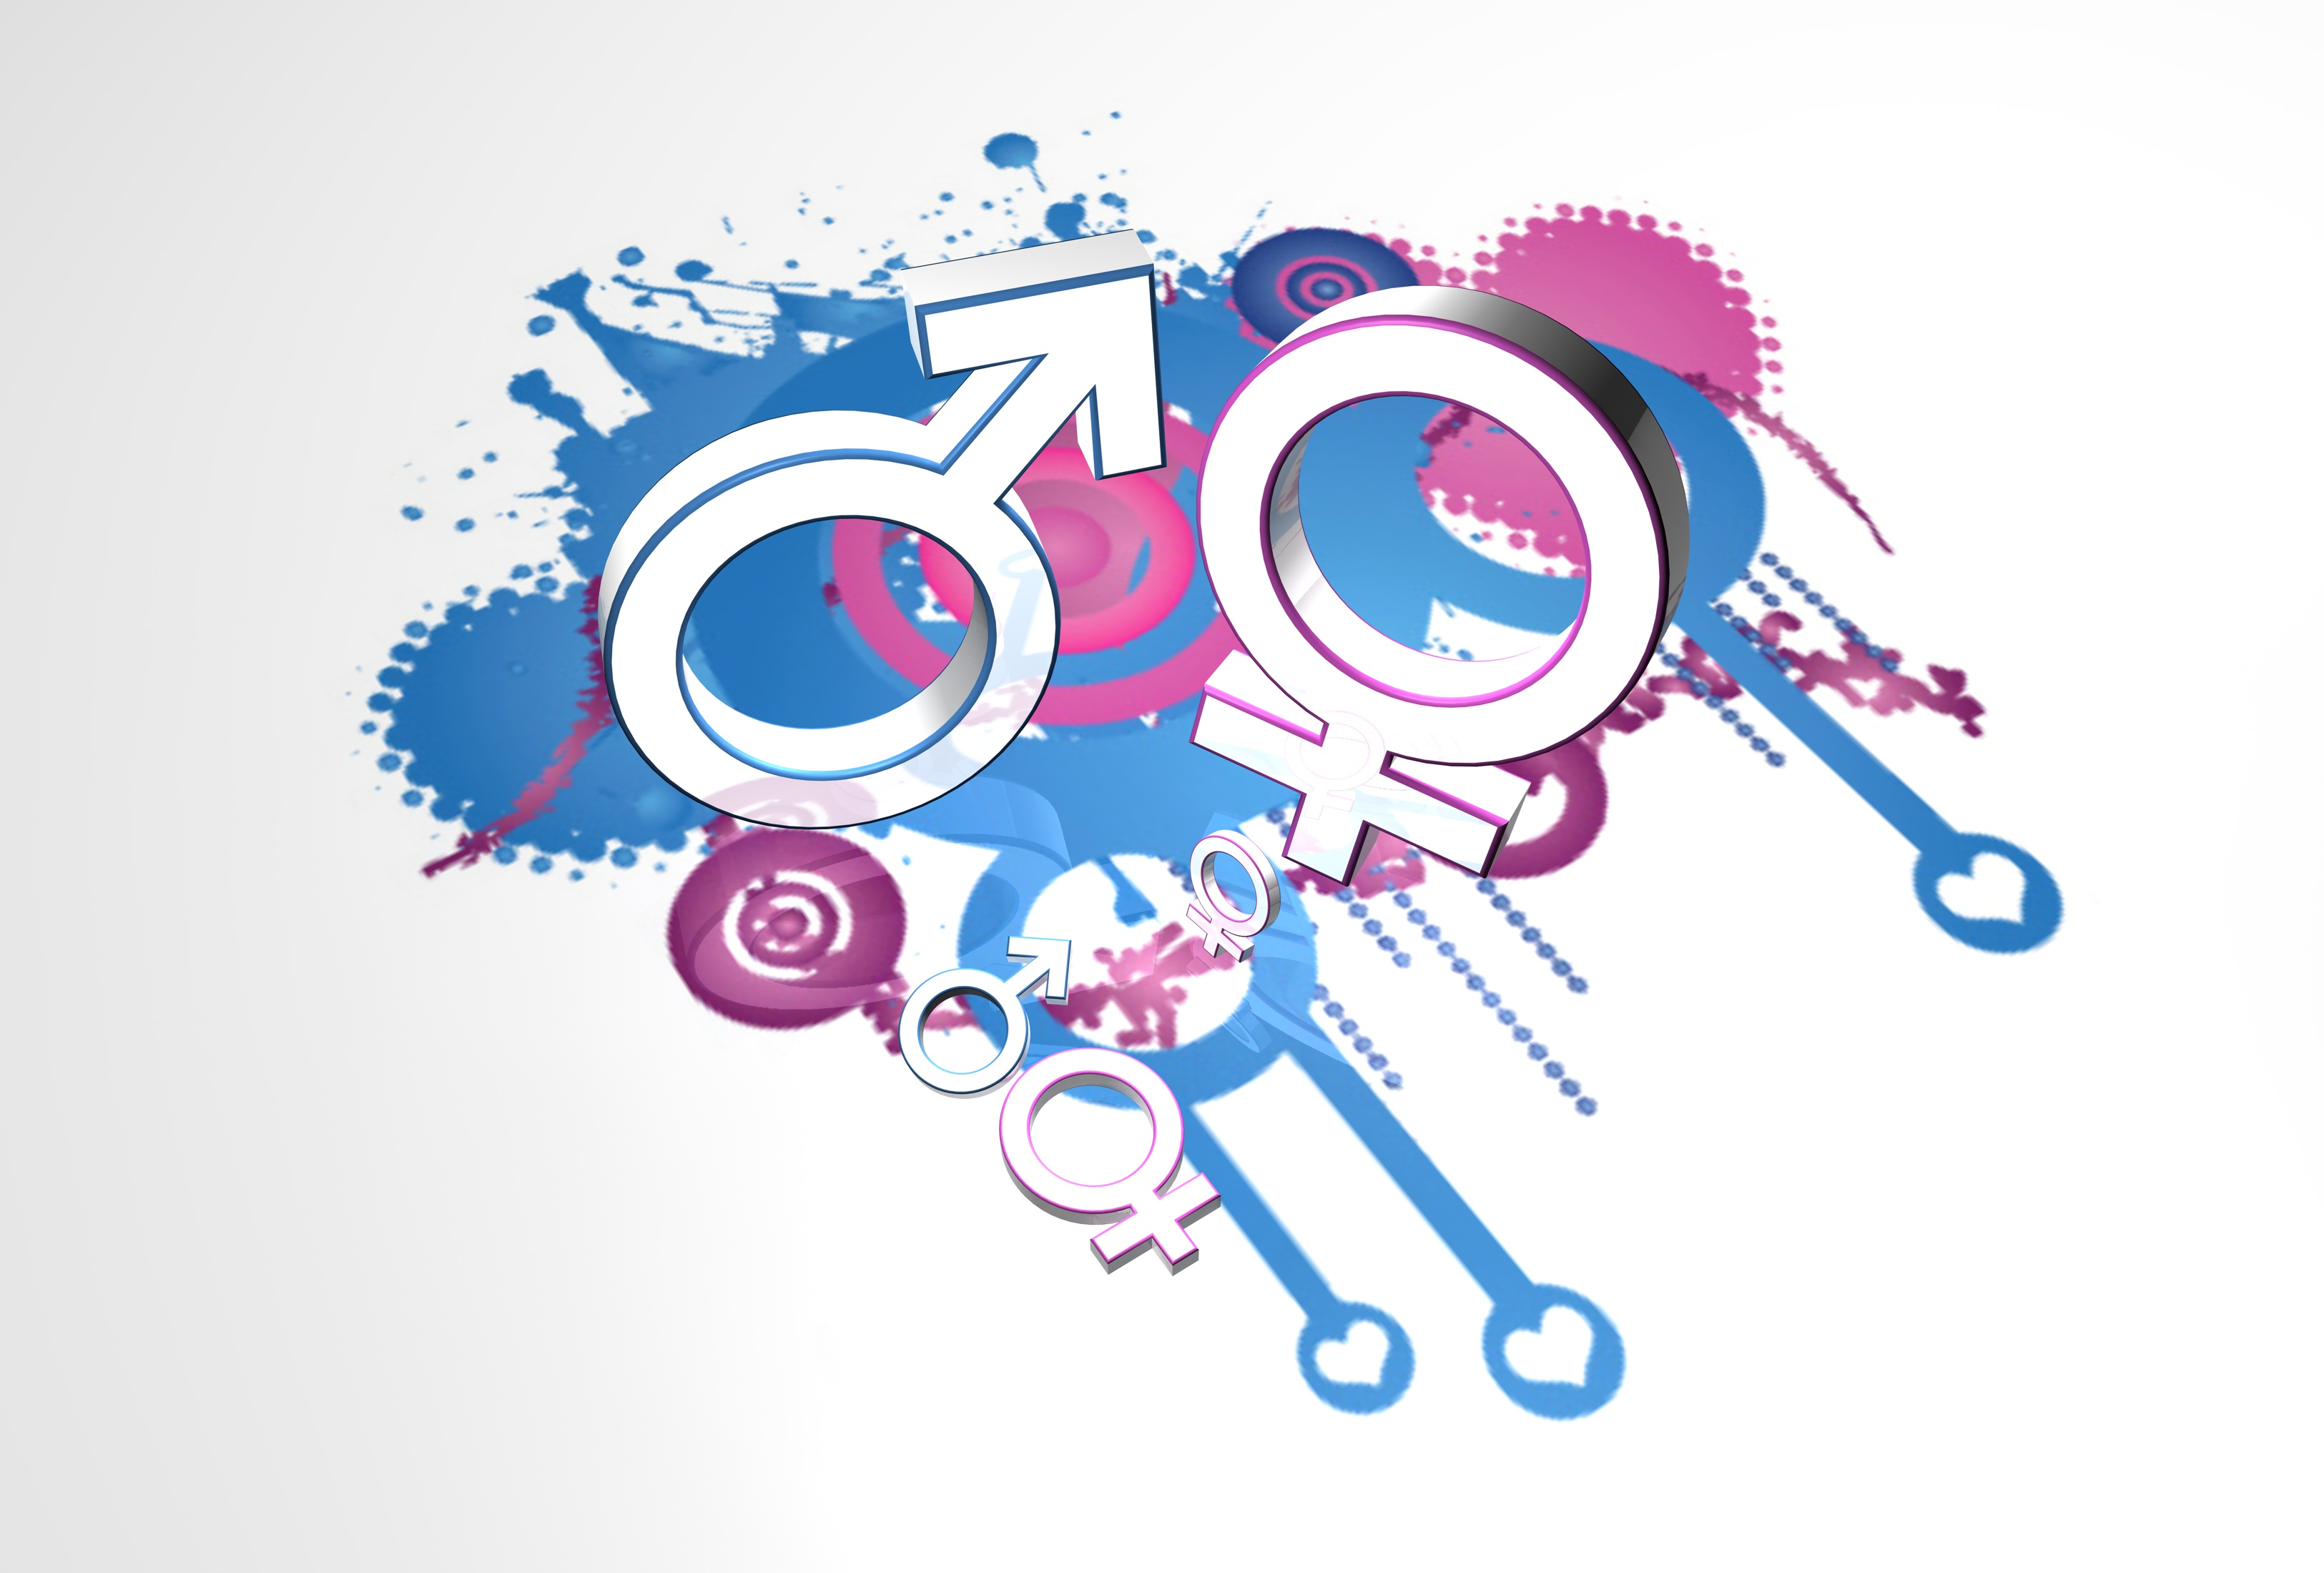 Shit parents fail to declare child's gender in #socialmedia accounts